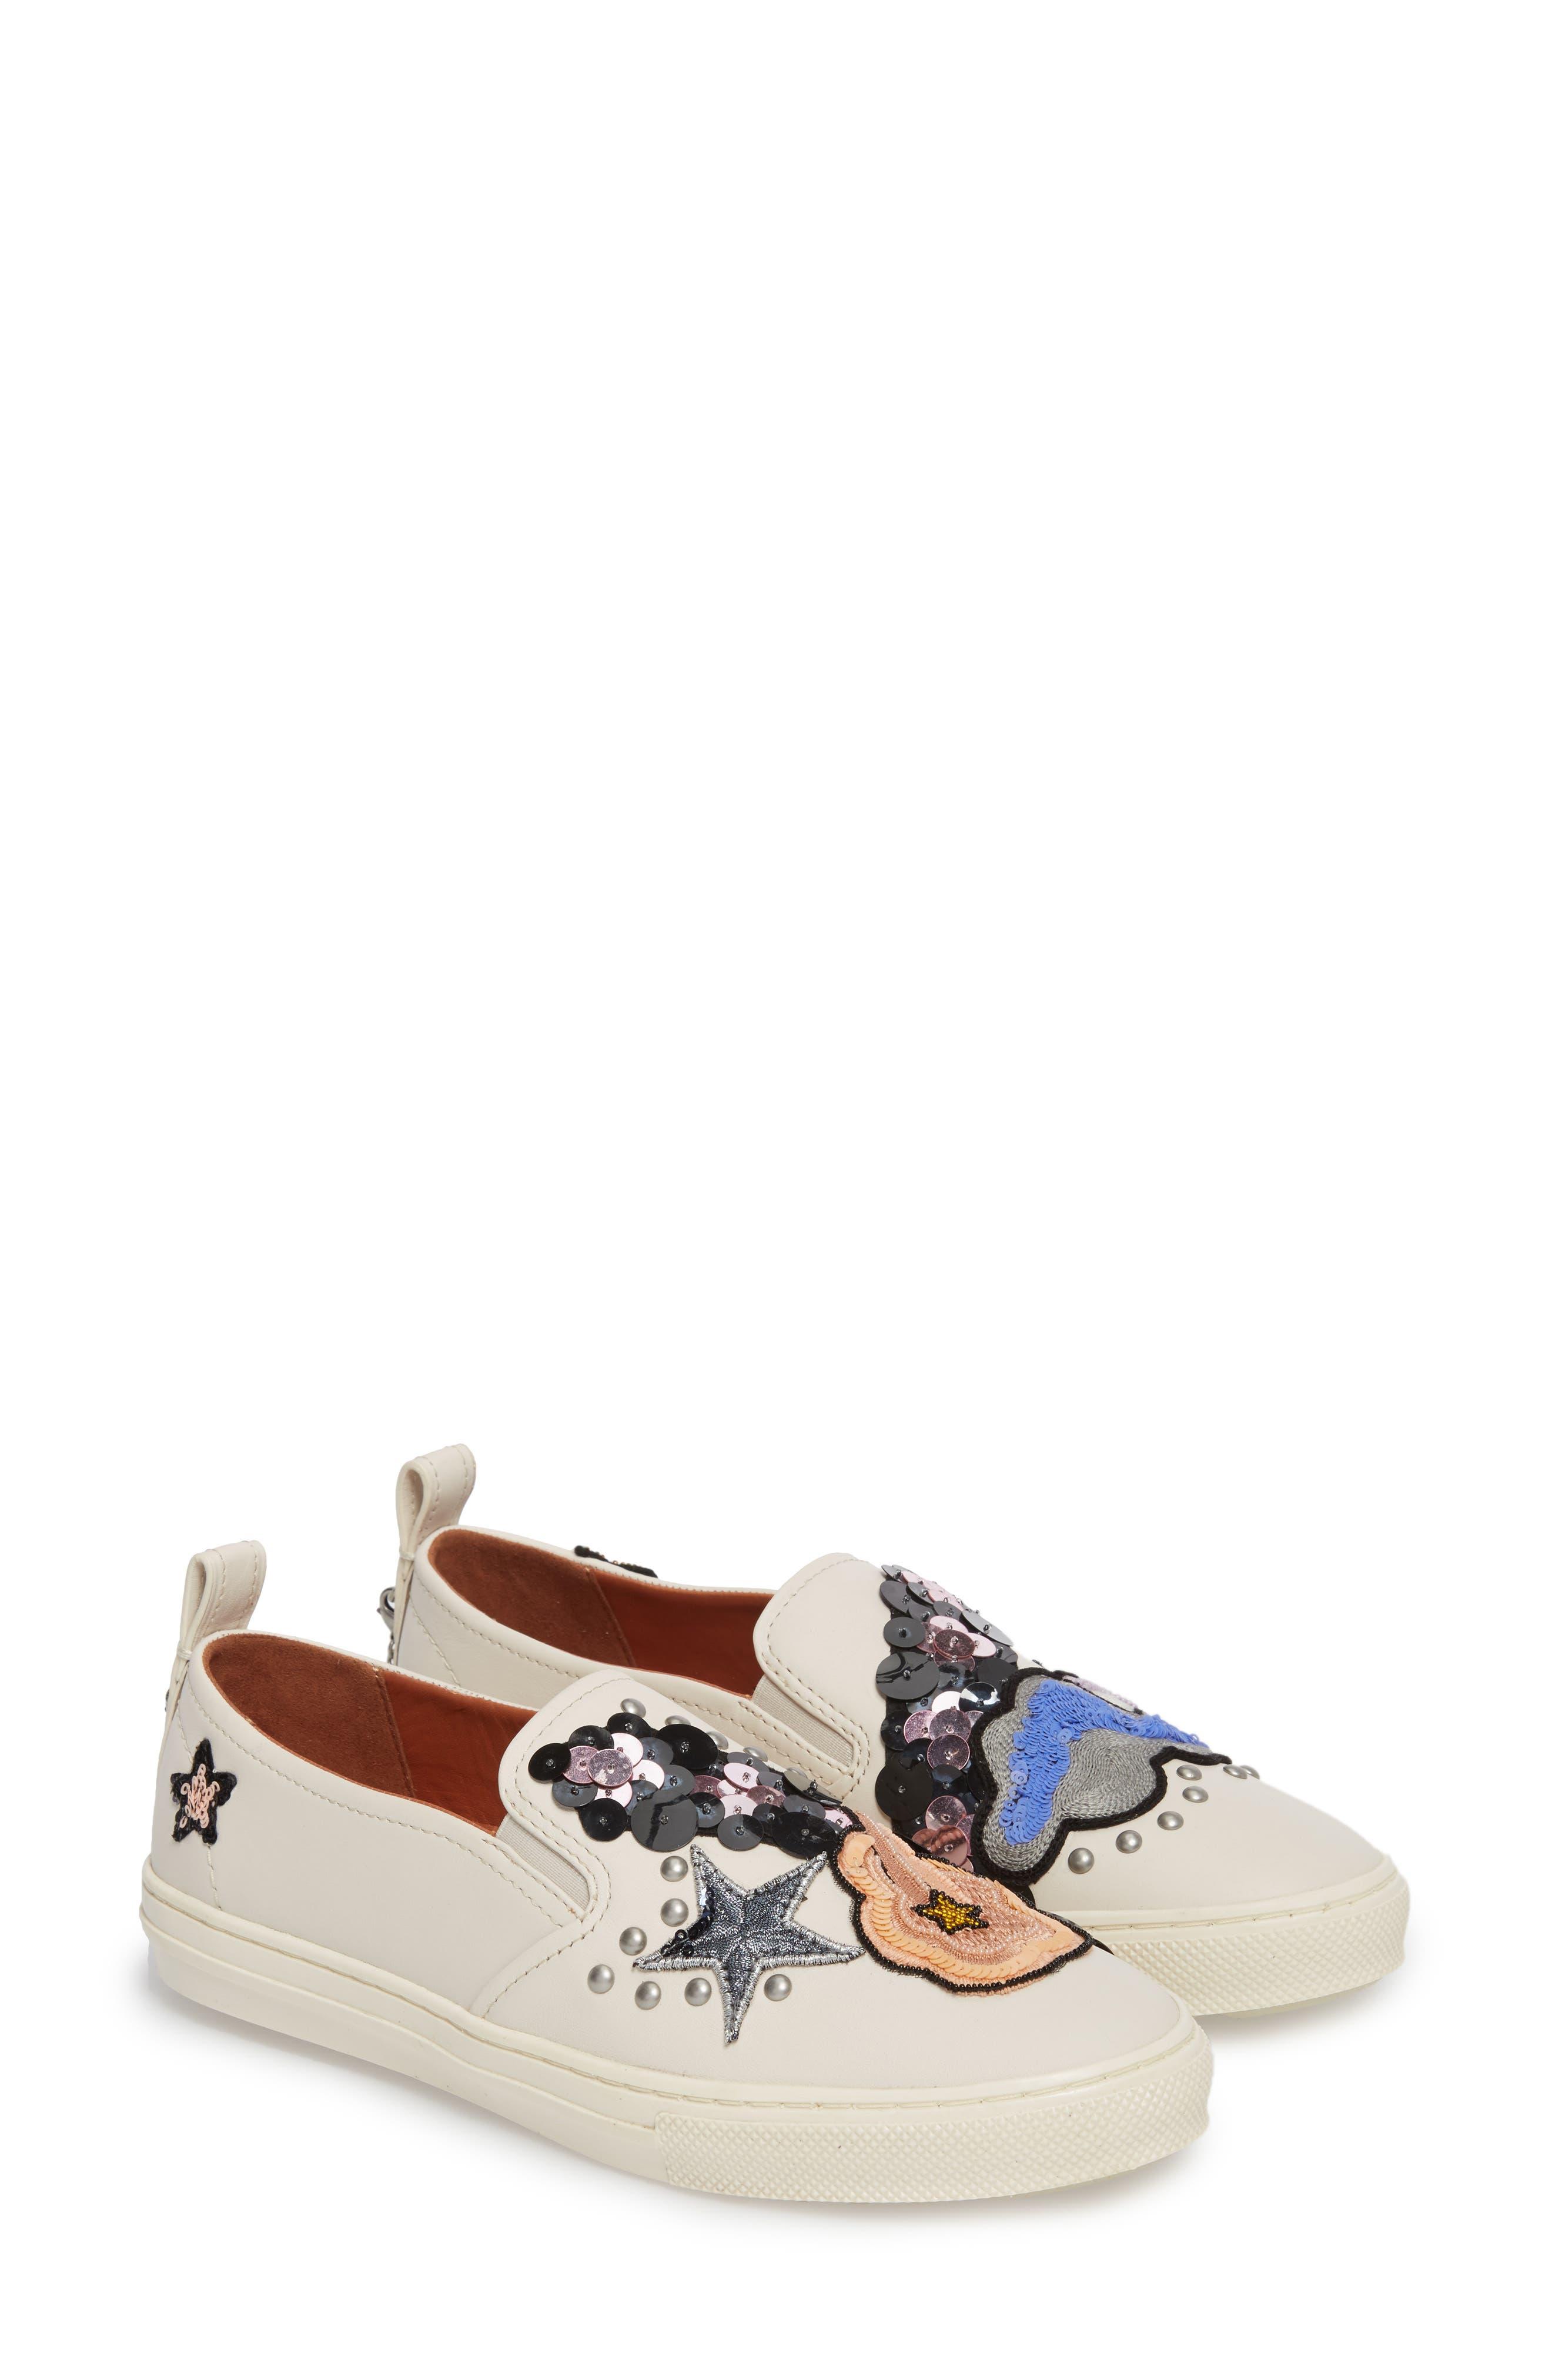 Star Patch Slip-On Sneaker,                             Alternate thumbnail 4, color,                             Chalk Leather